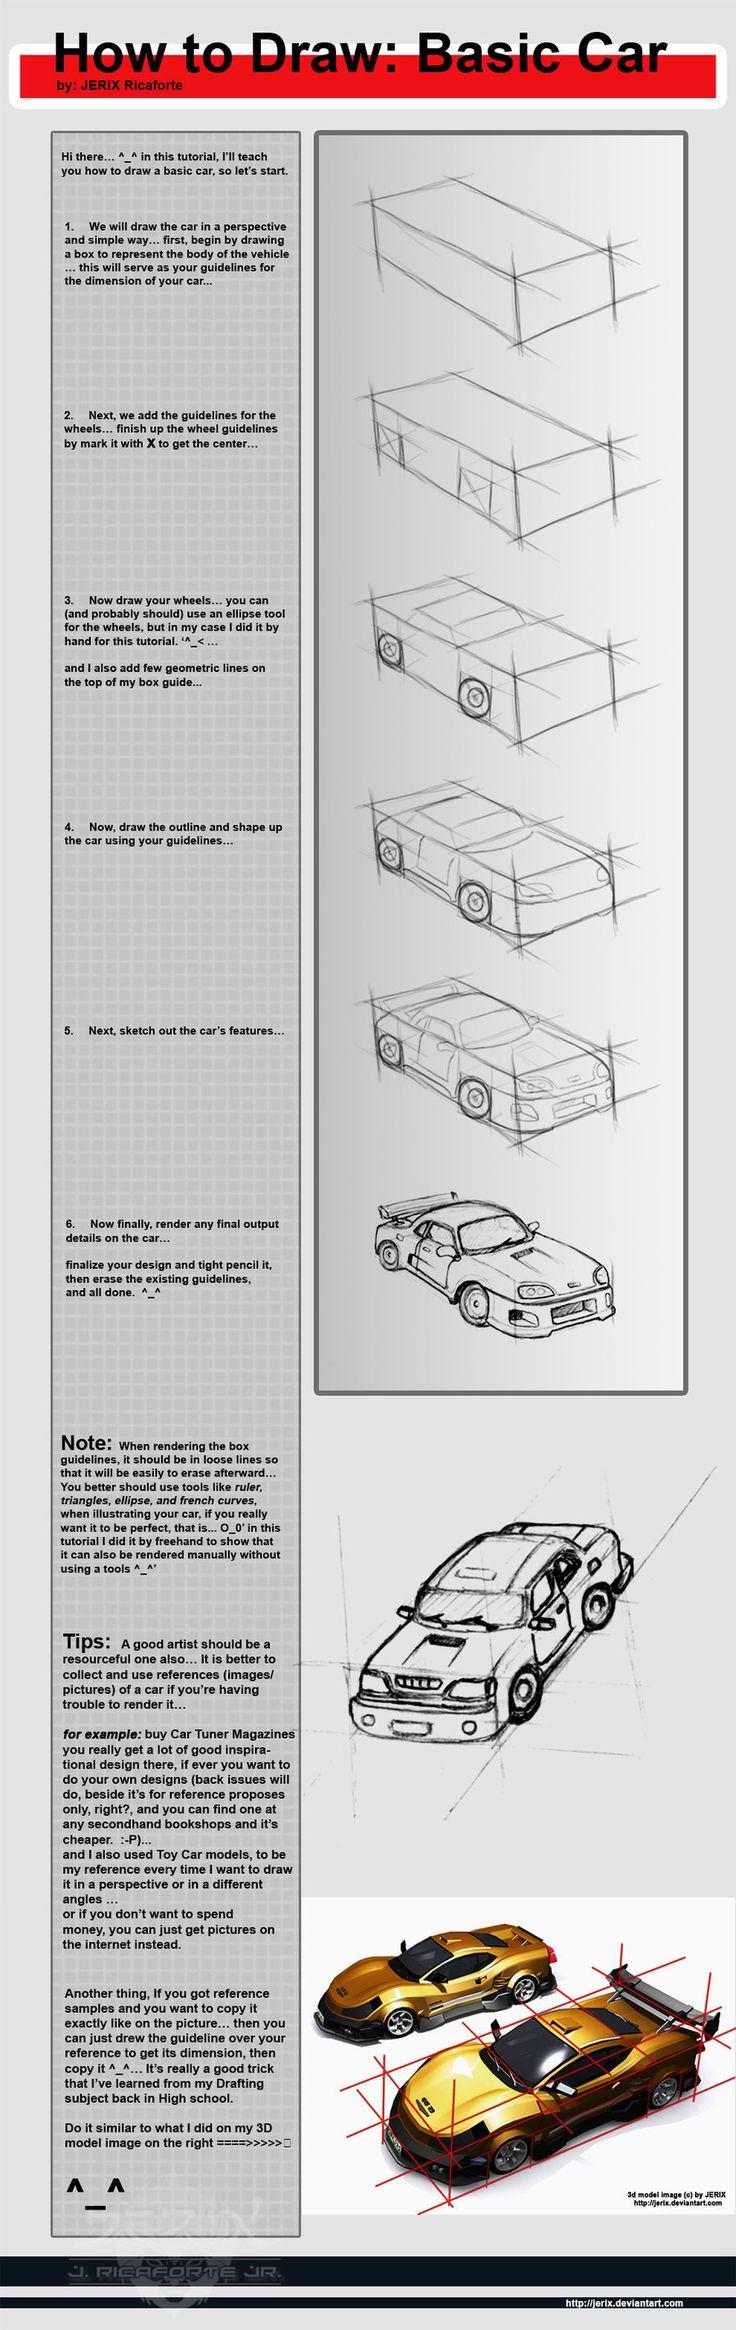 How to draw basic Car O_o by jerix